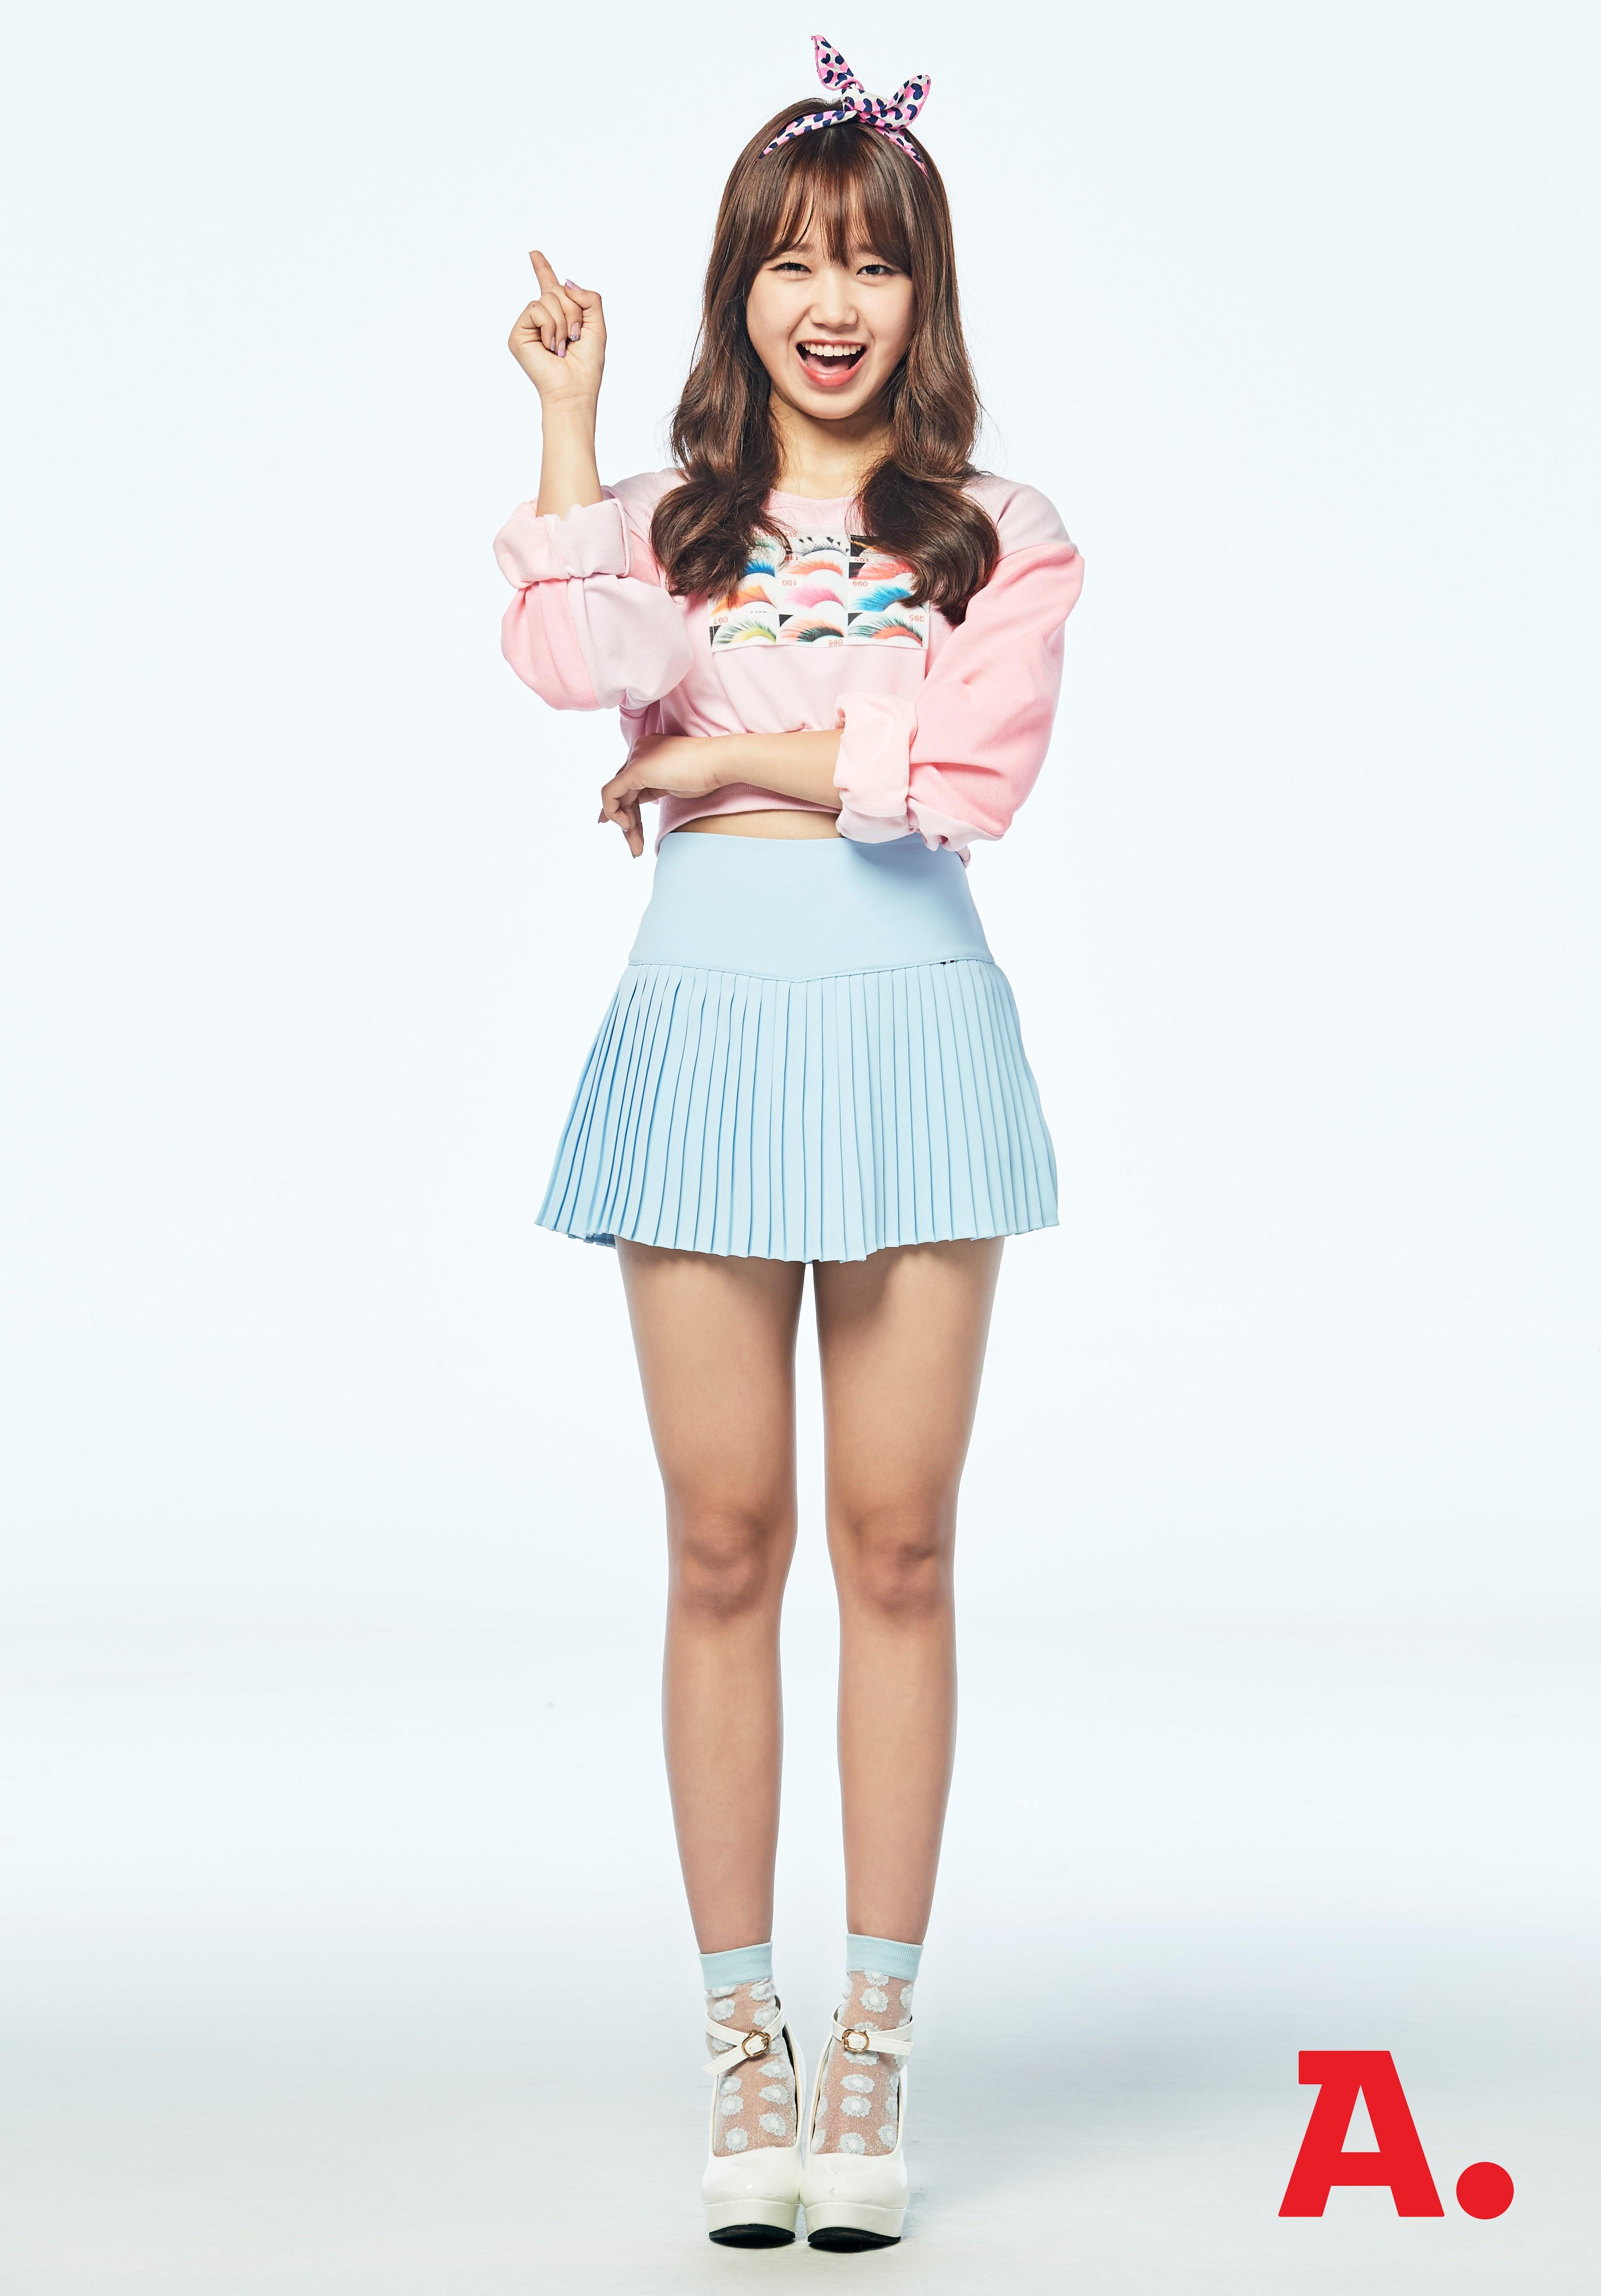 tags k pop i o i choi yoo jung pink shirt